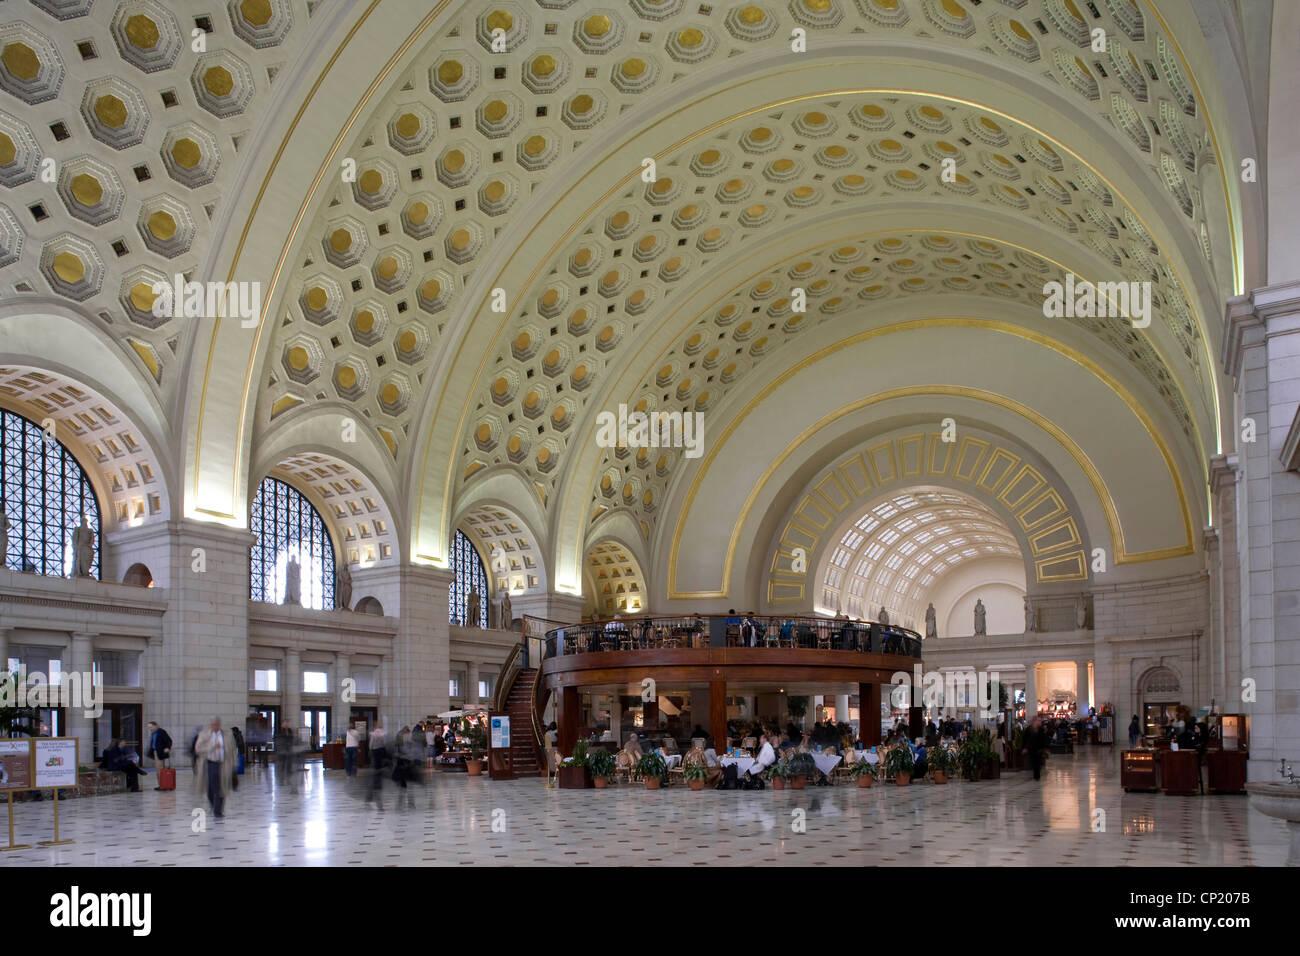 Main Hall, Union Station, Washington D.C. USA, Architects: Architects: Daniel Burnham, assisted by Pierce Anderson Stock Photo